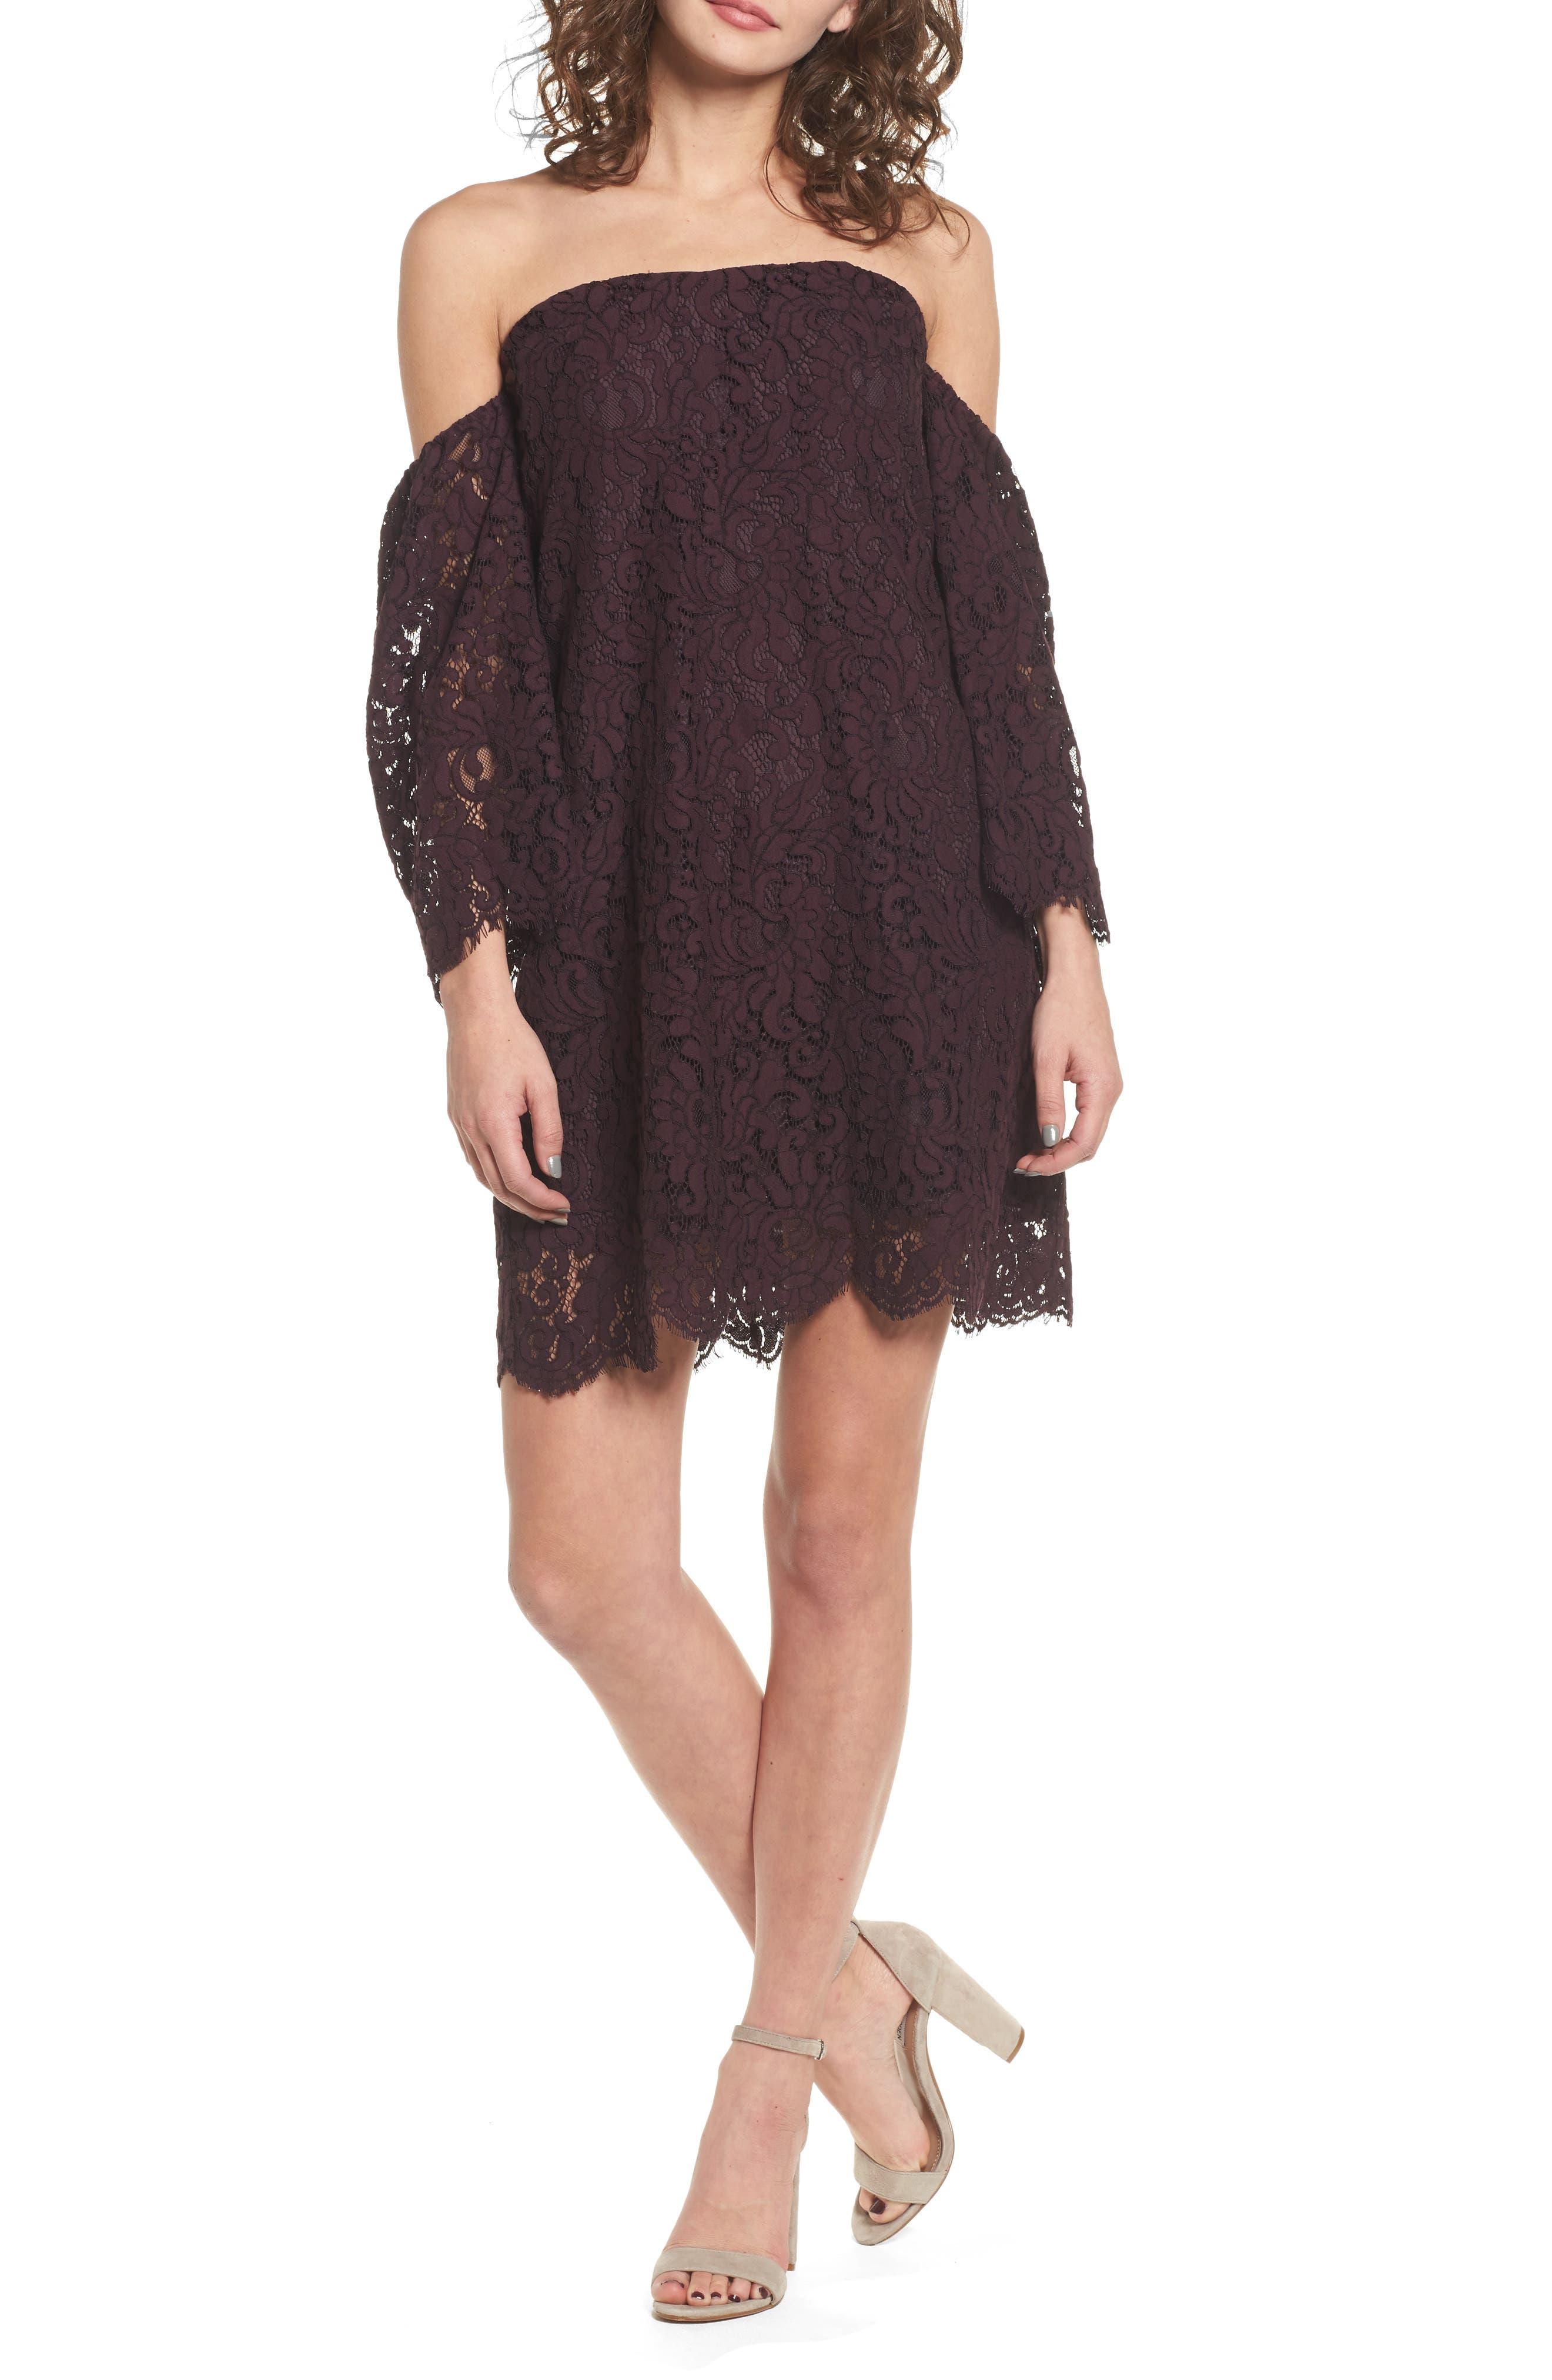 Adalira Off the Shoulder Lace Dress,                         Main,                         color, 930